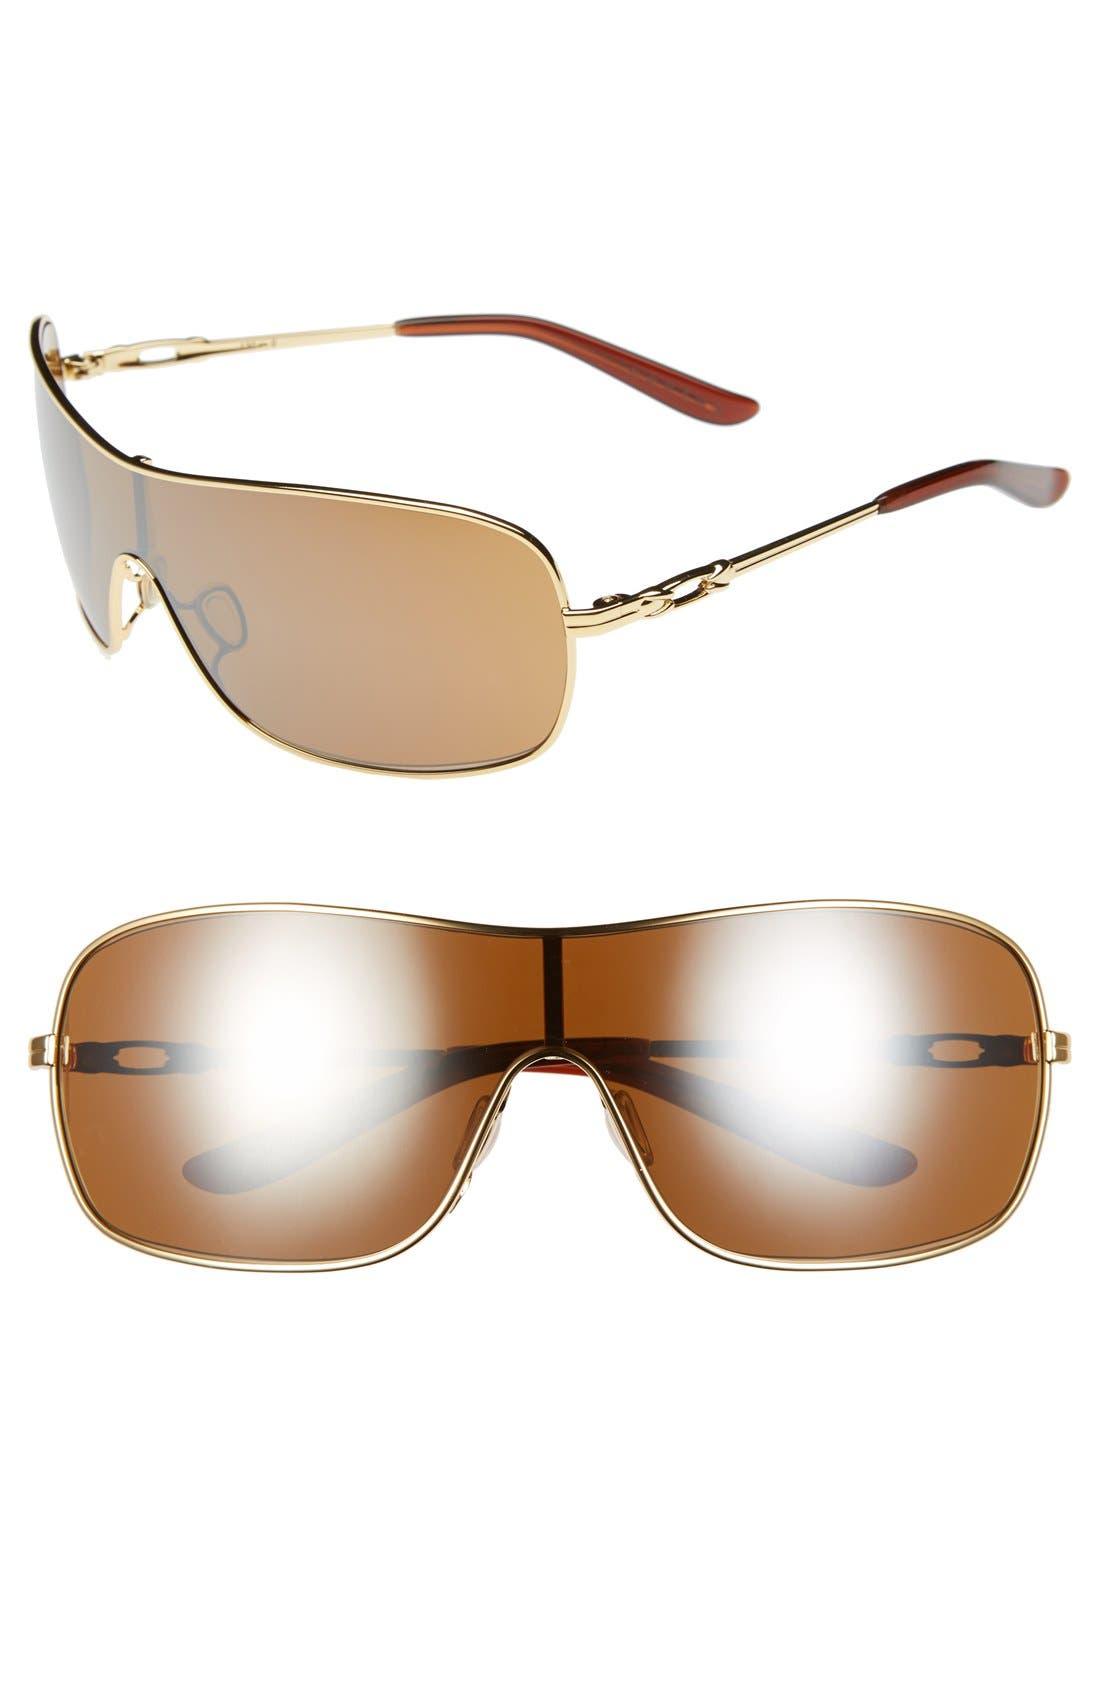 Alternate Image 1 Selected - Oakley 'Distress' 150mm Polarized Shield Sunglasses